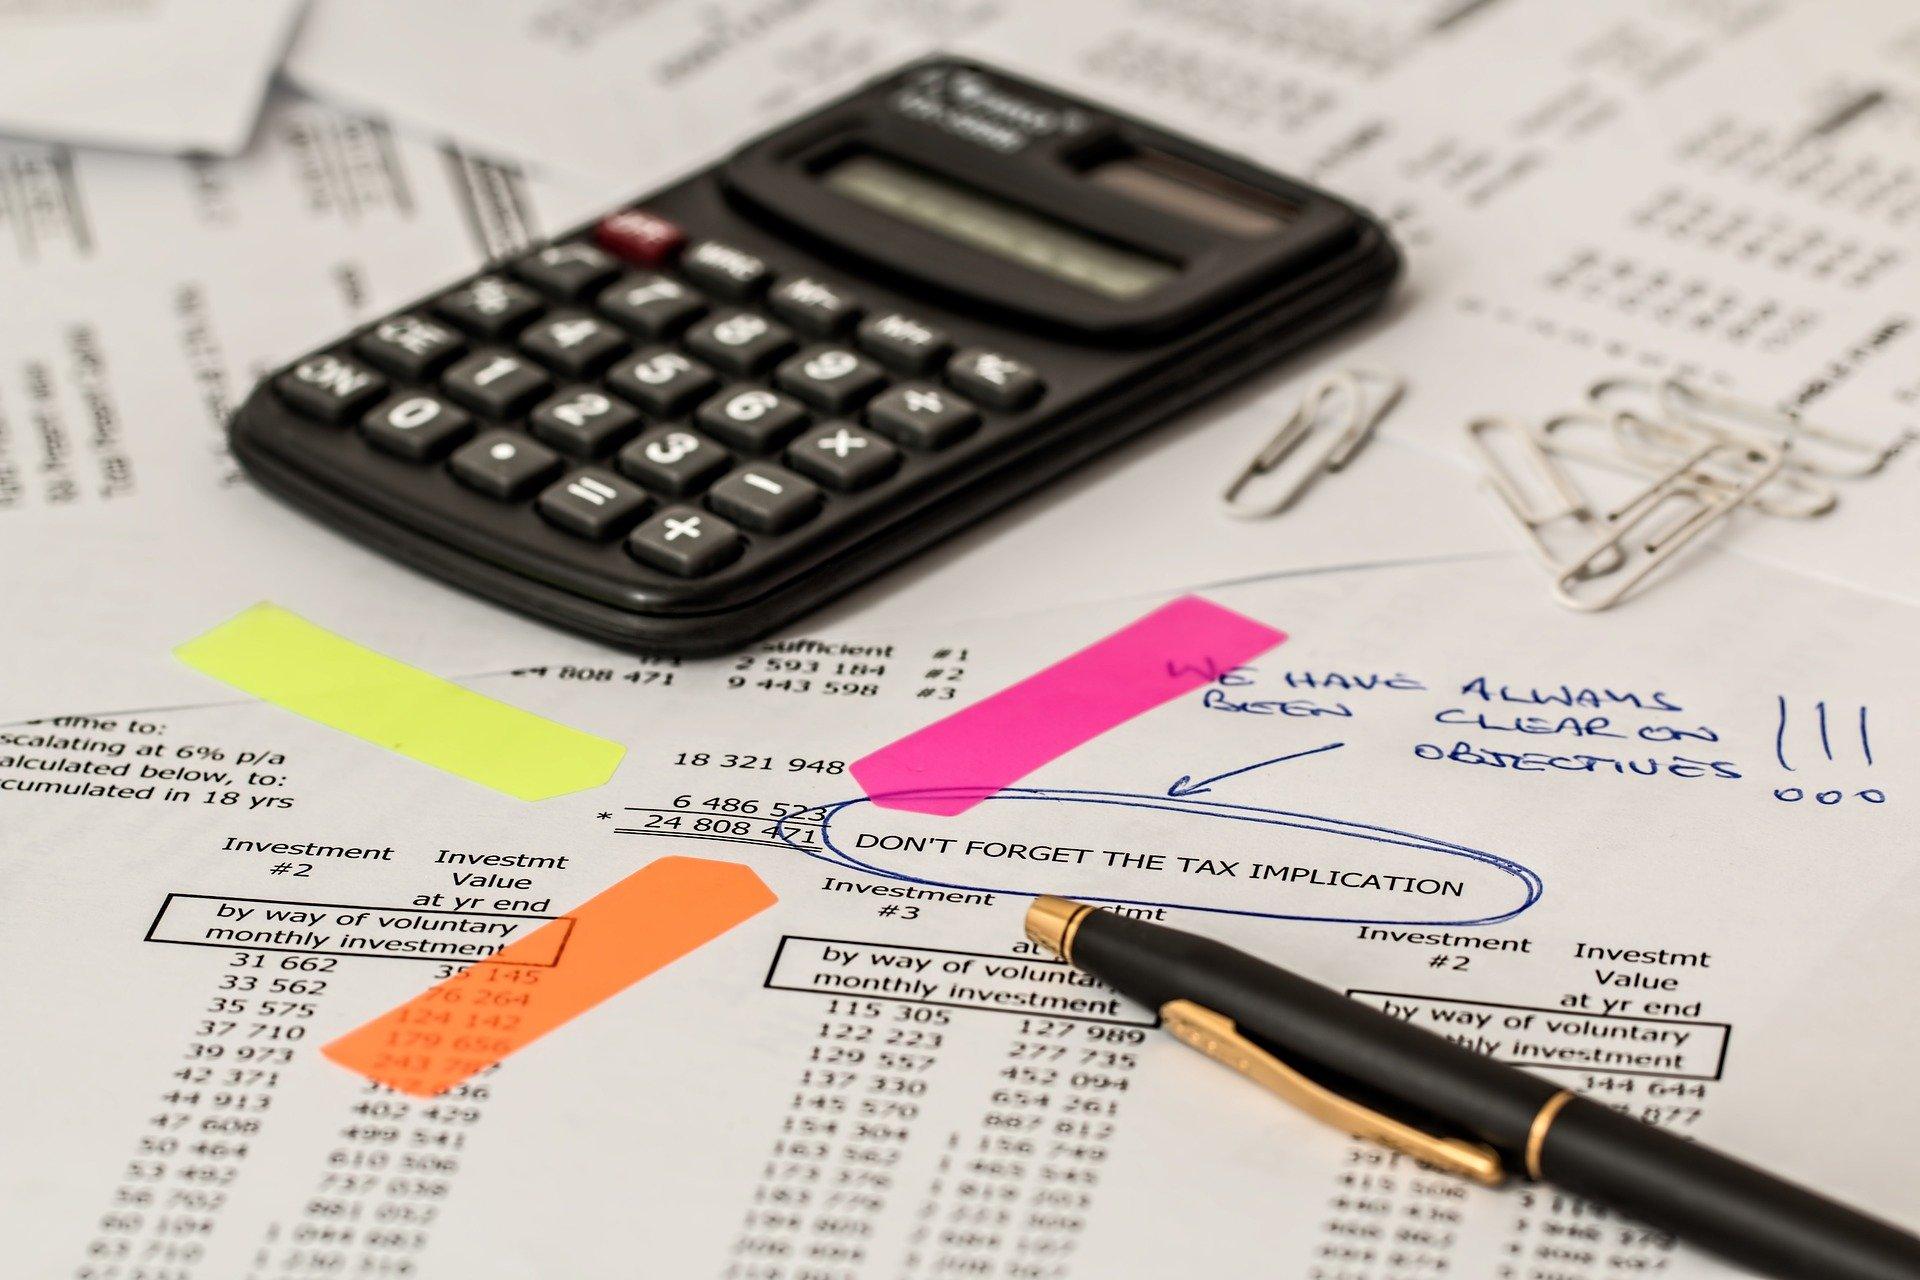 Accounts & Finance Executive   1+ Years